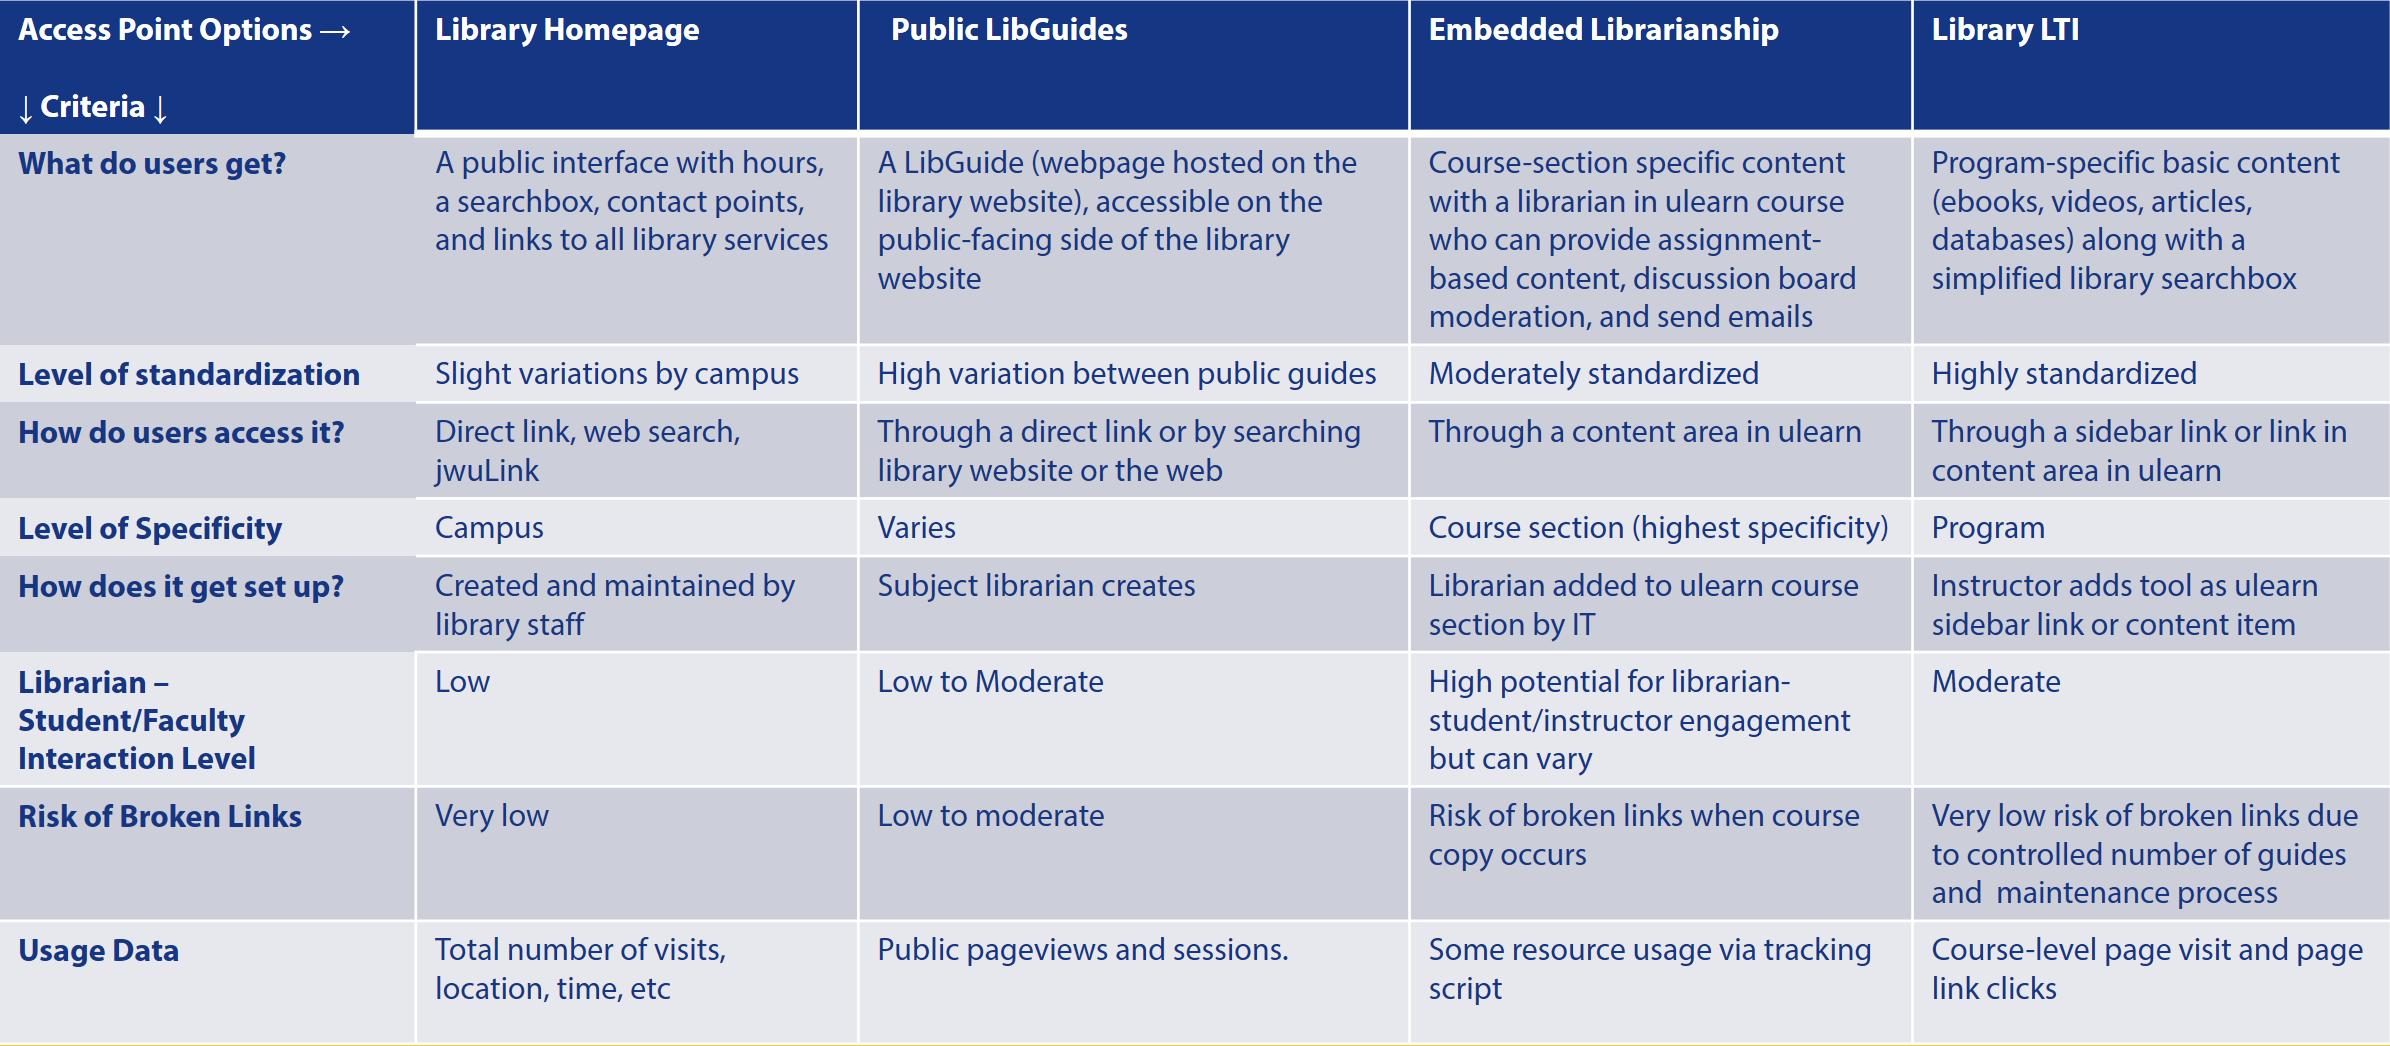 Library Services ComparisonTable